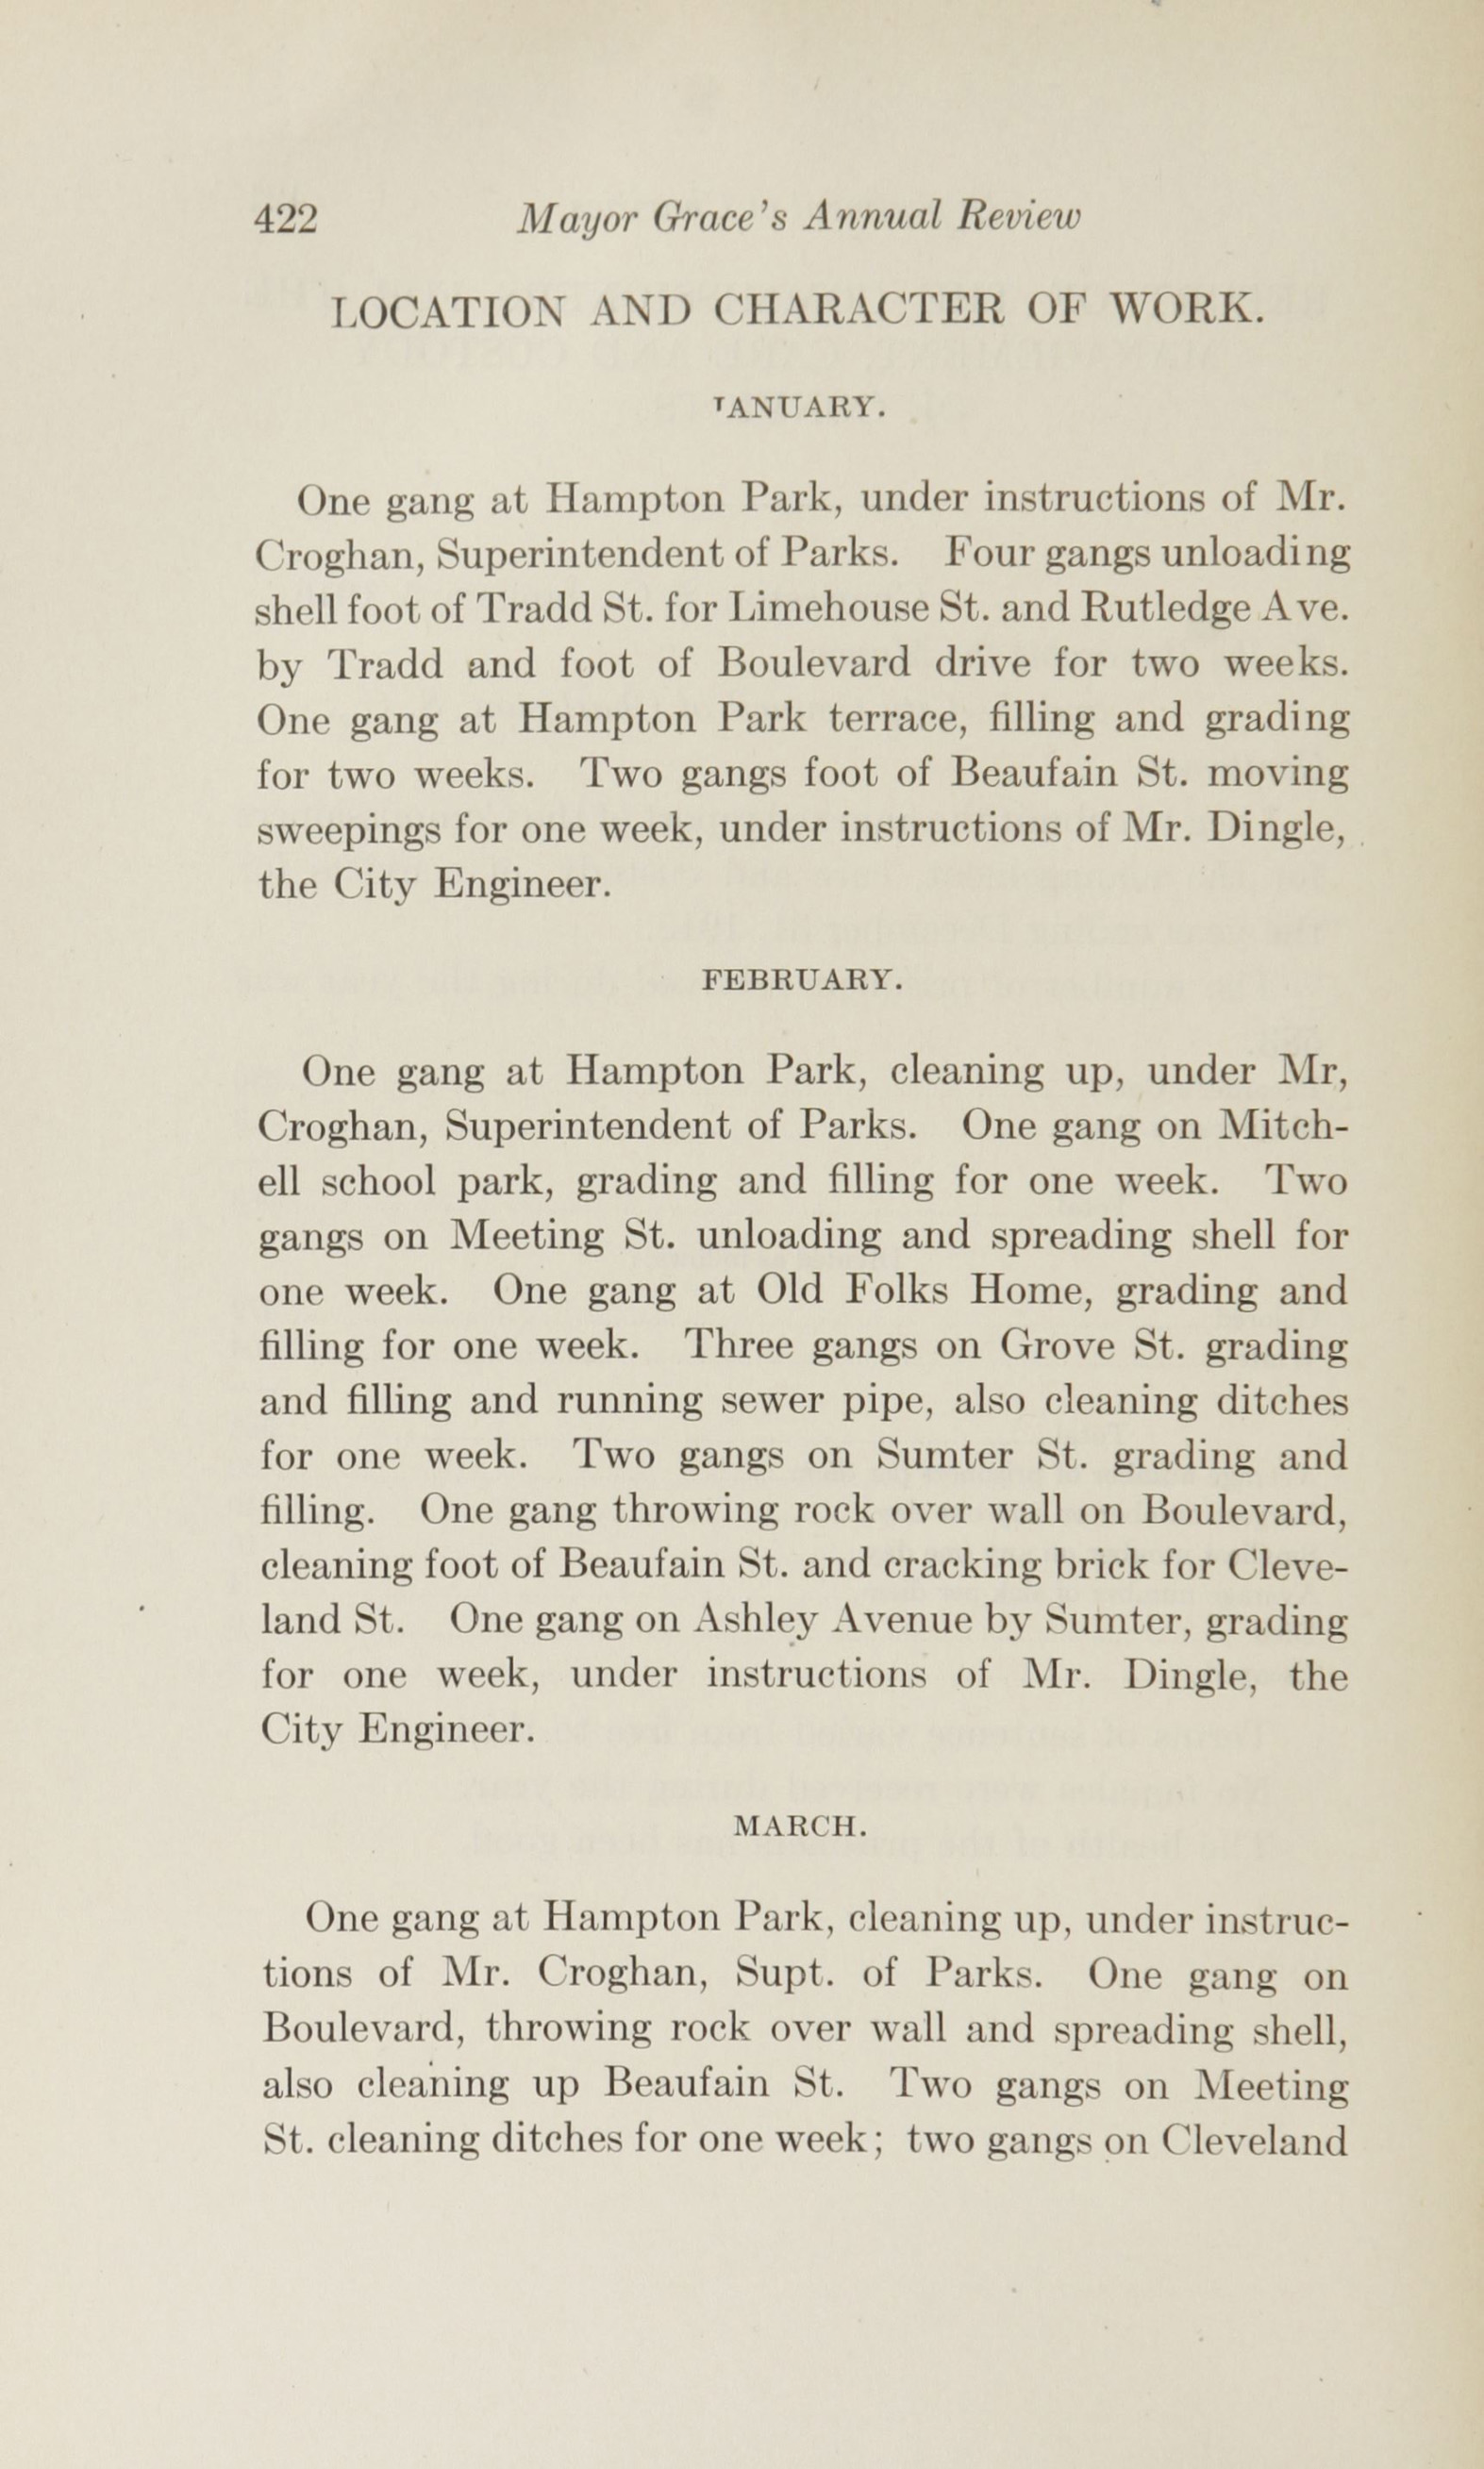 Charleston Yearbook, 1915, page 422